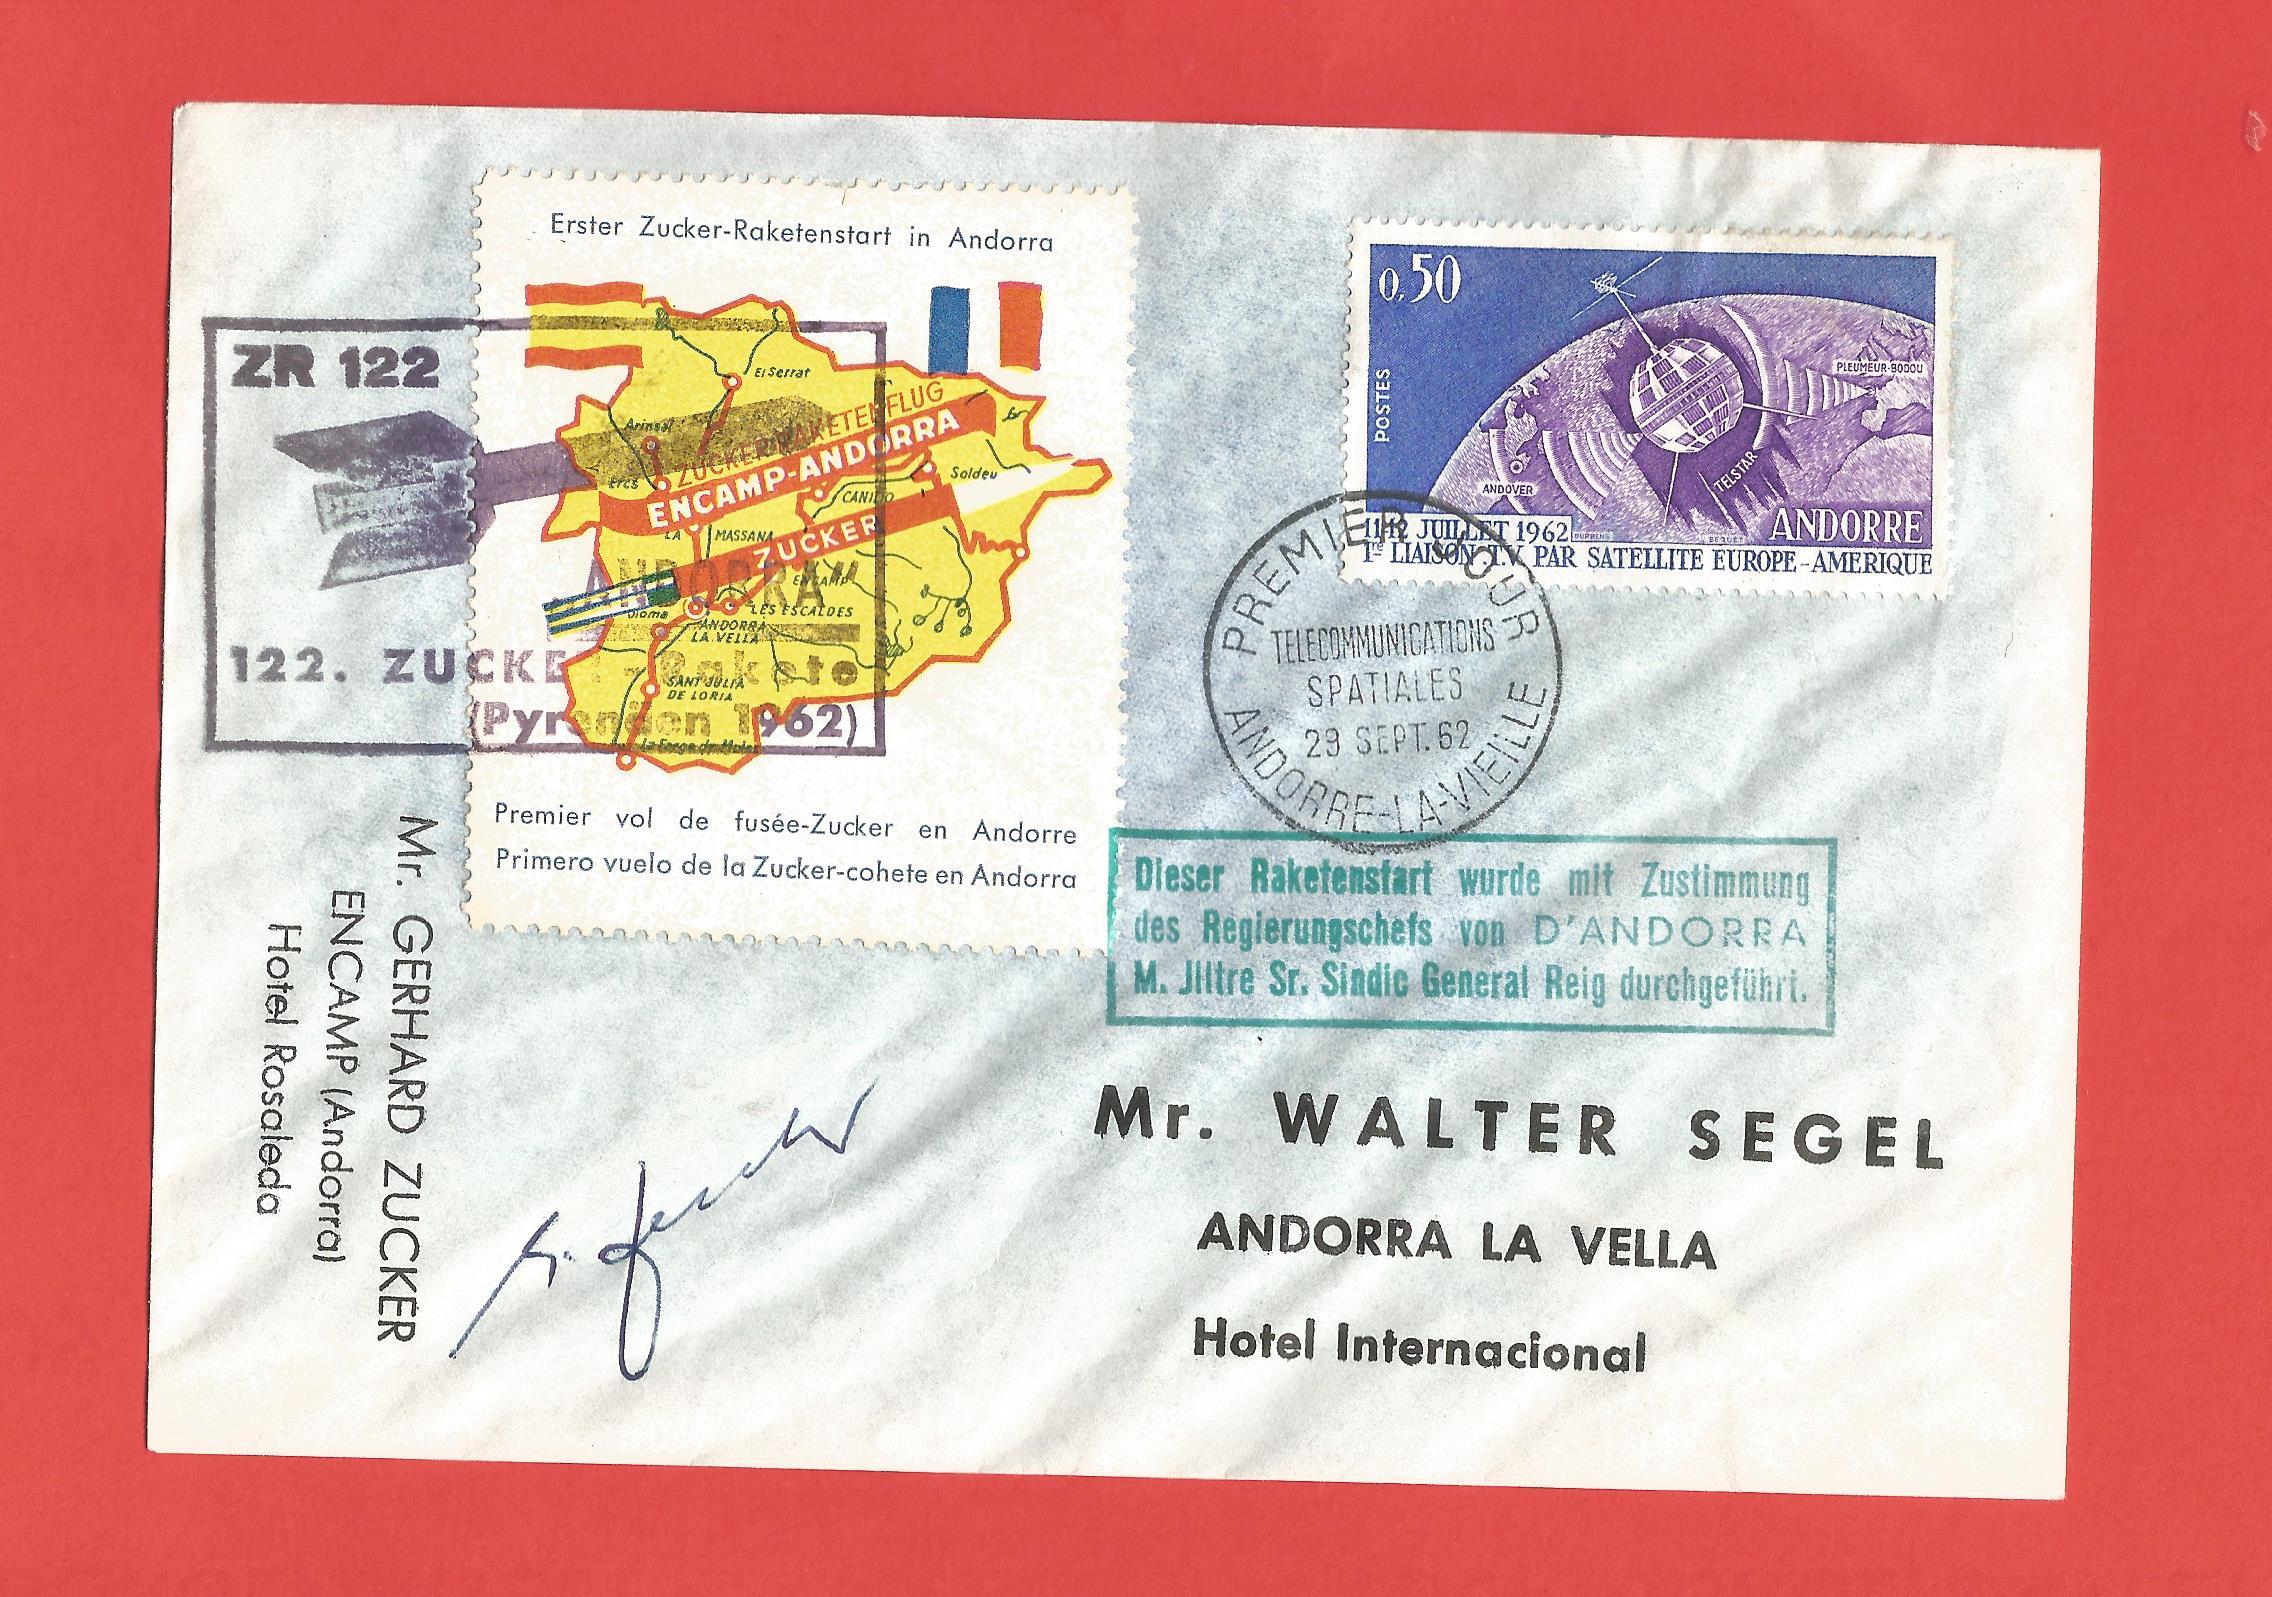 Gerhard Zucker signed rocket mail, rocket-flown FDC for ANDORRA Telstar Space Satellite stamp from